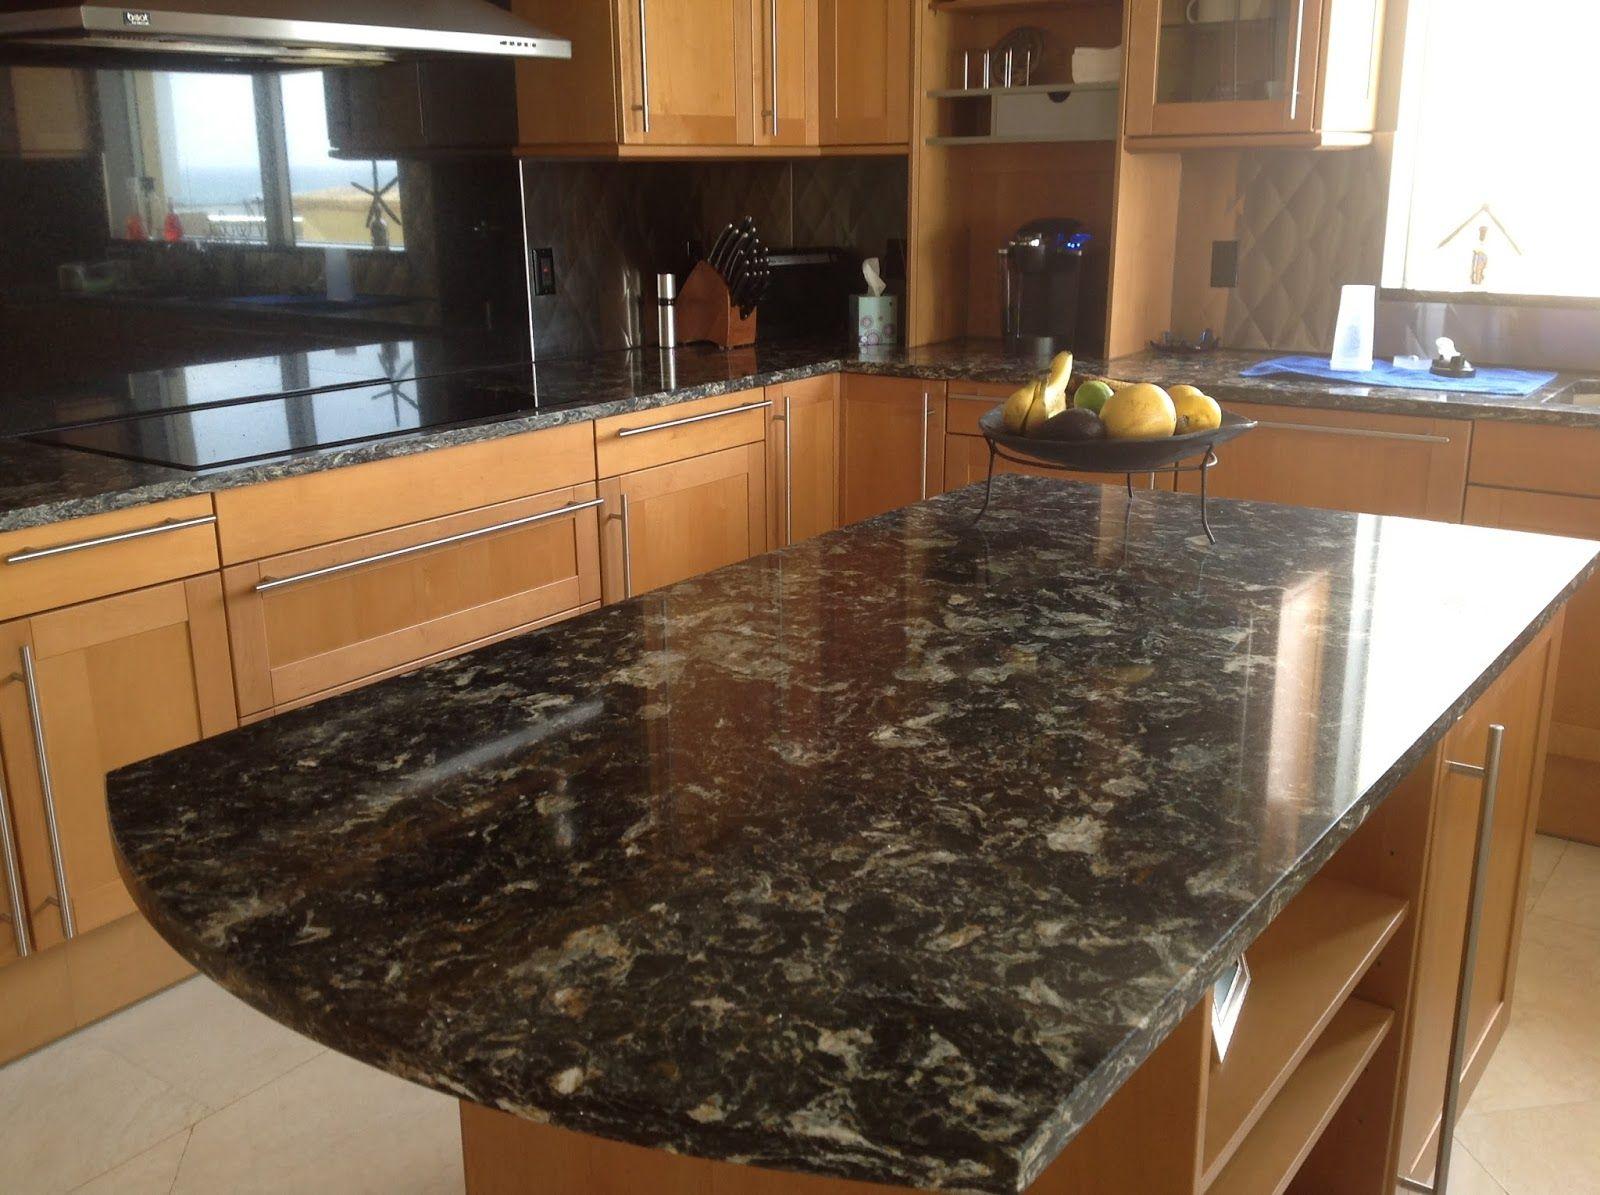 43 Reference Of Cambria Countertops Cost Costco Cambria Countertops Quartz Kitchen Countertops Cambria Quartz Countertops